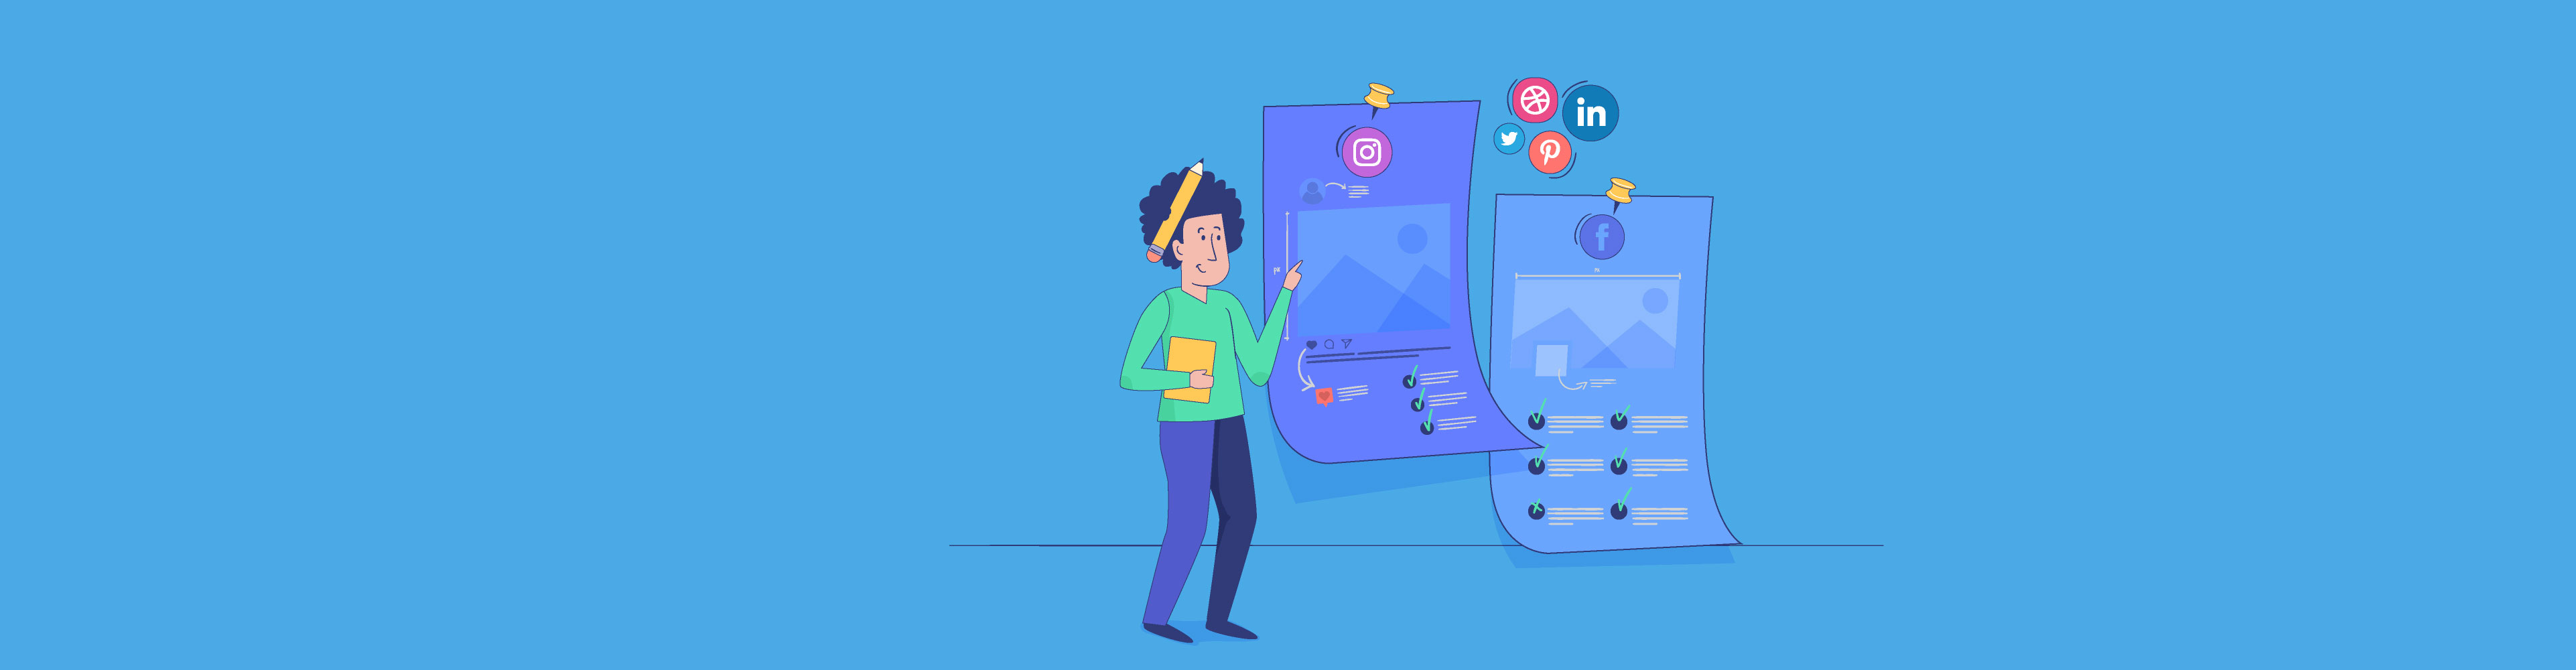 social media infographic - header wide